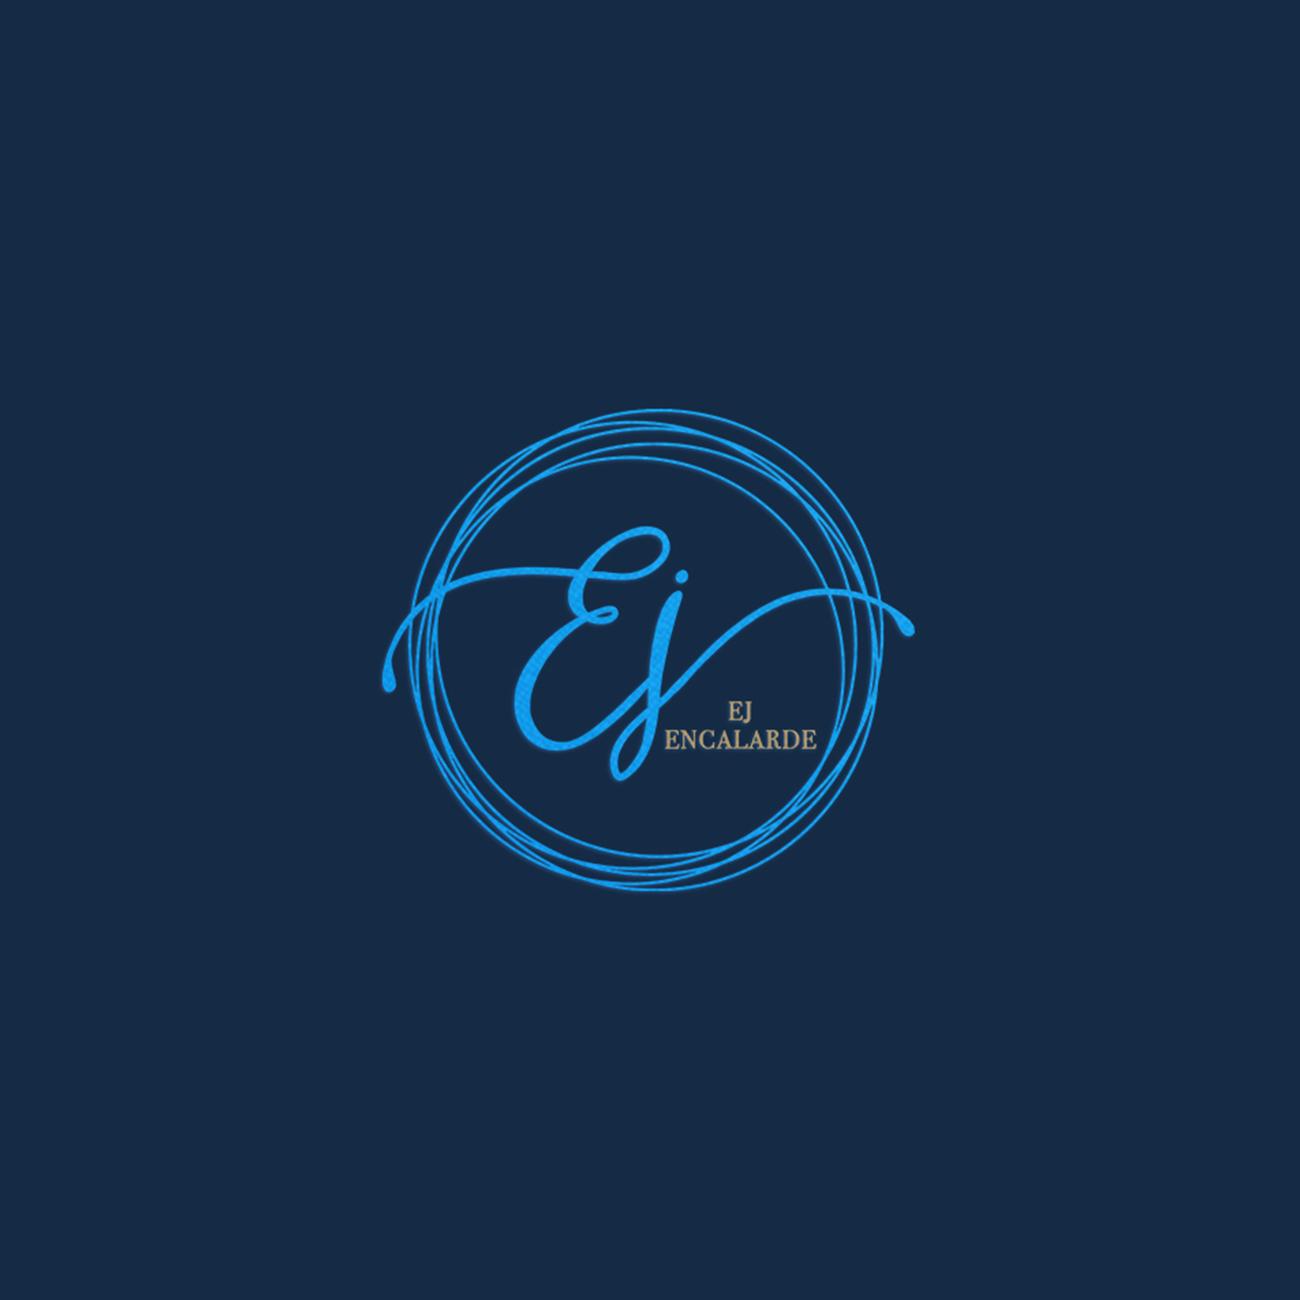 ejencalarde-portfolio2